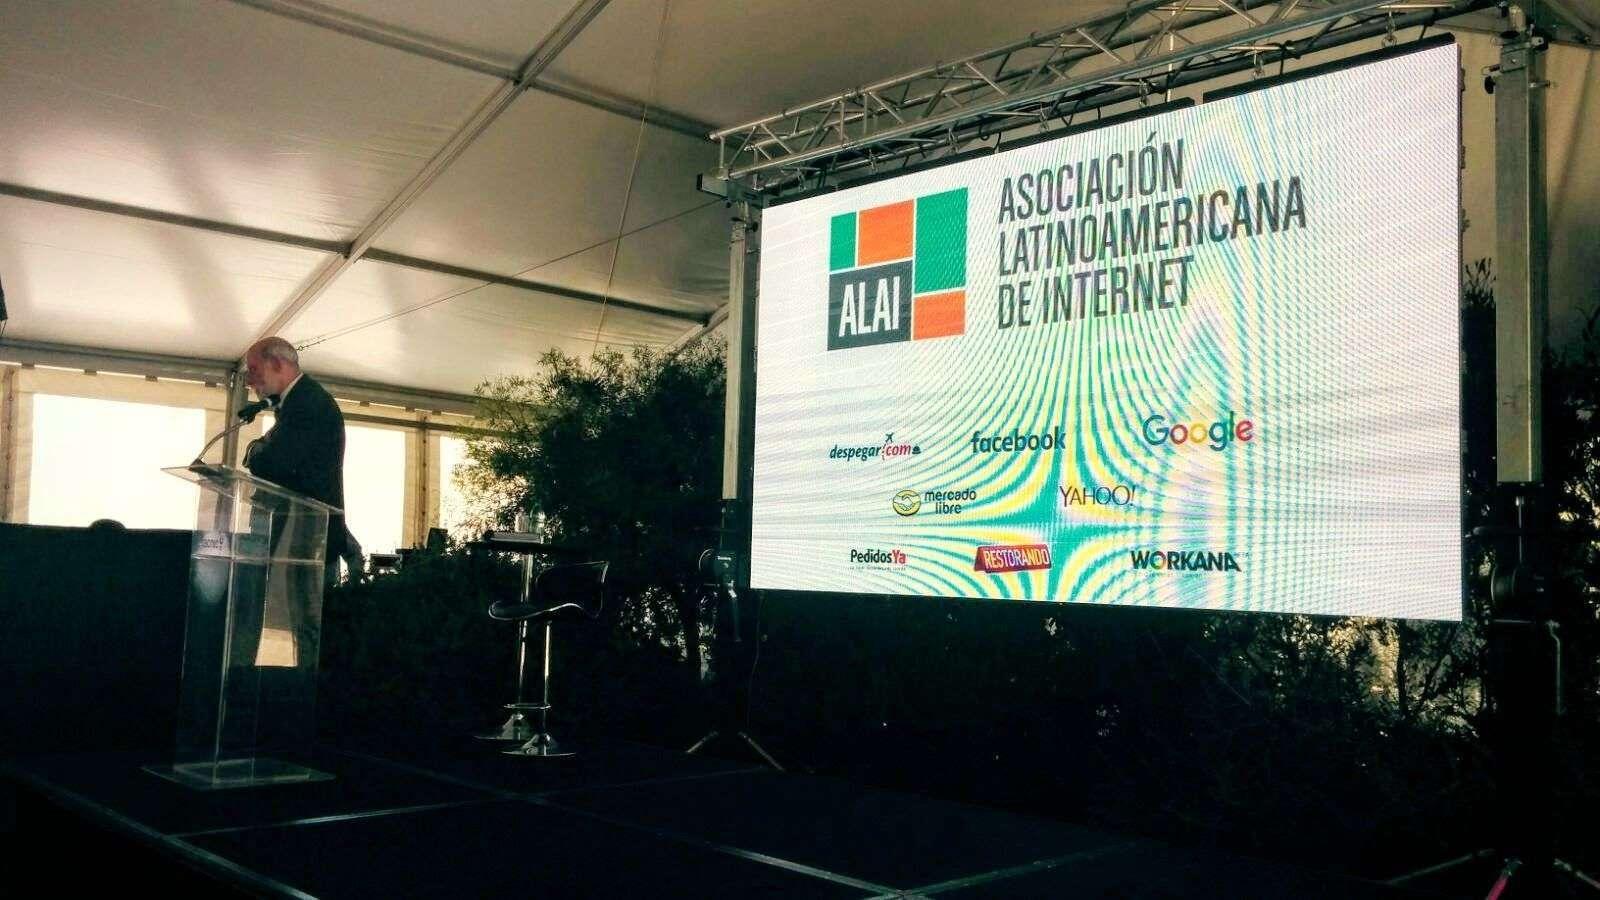 Na foto: Vint Cerf apresentando ALAI na Casa da Internet, no Uruguai